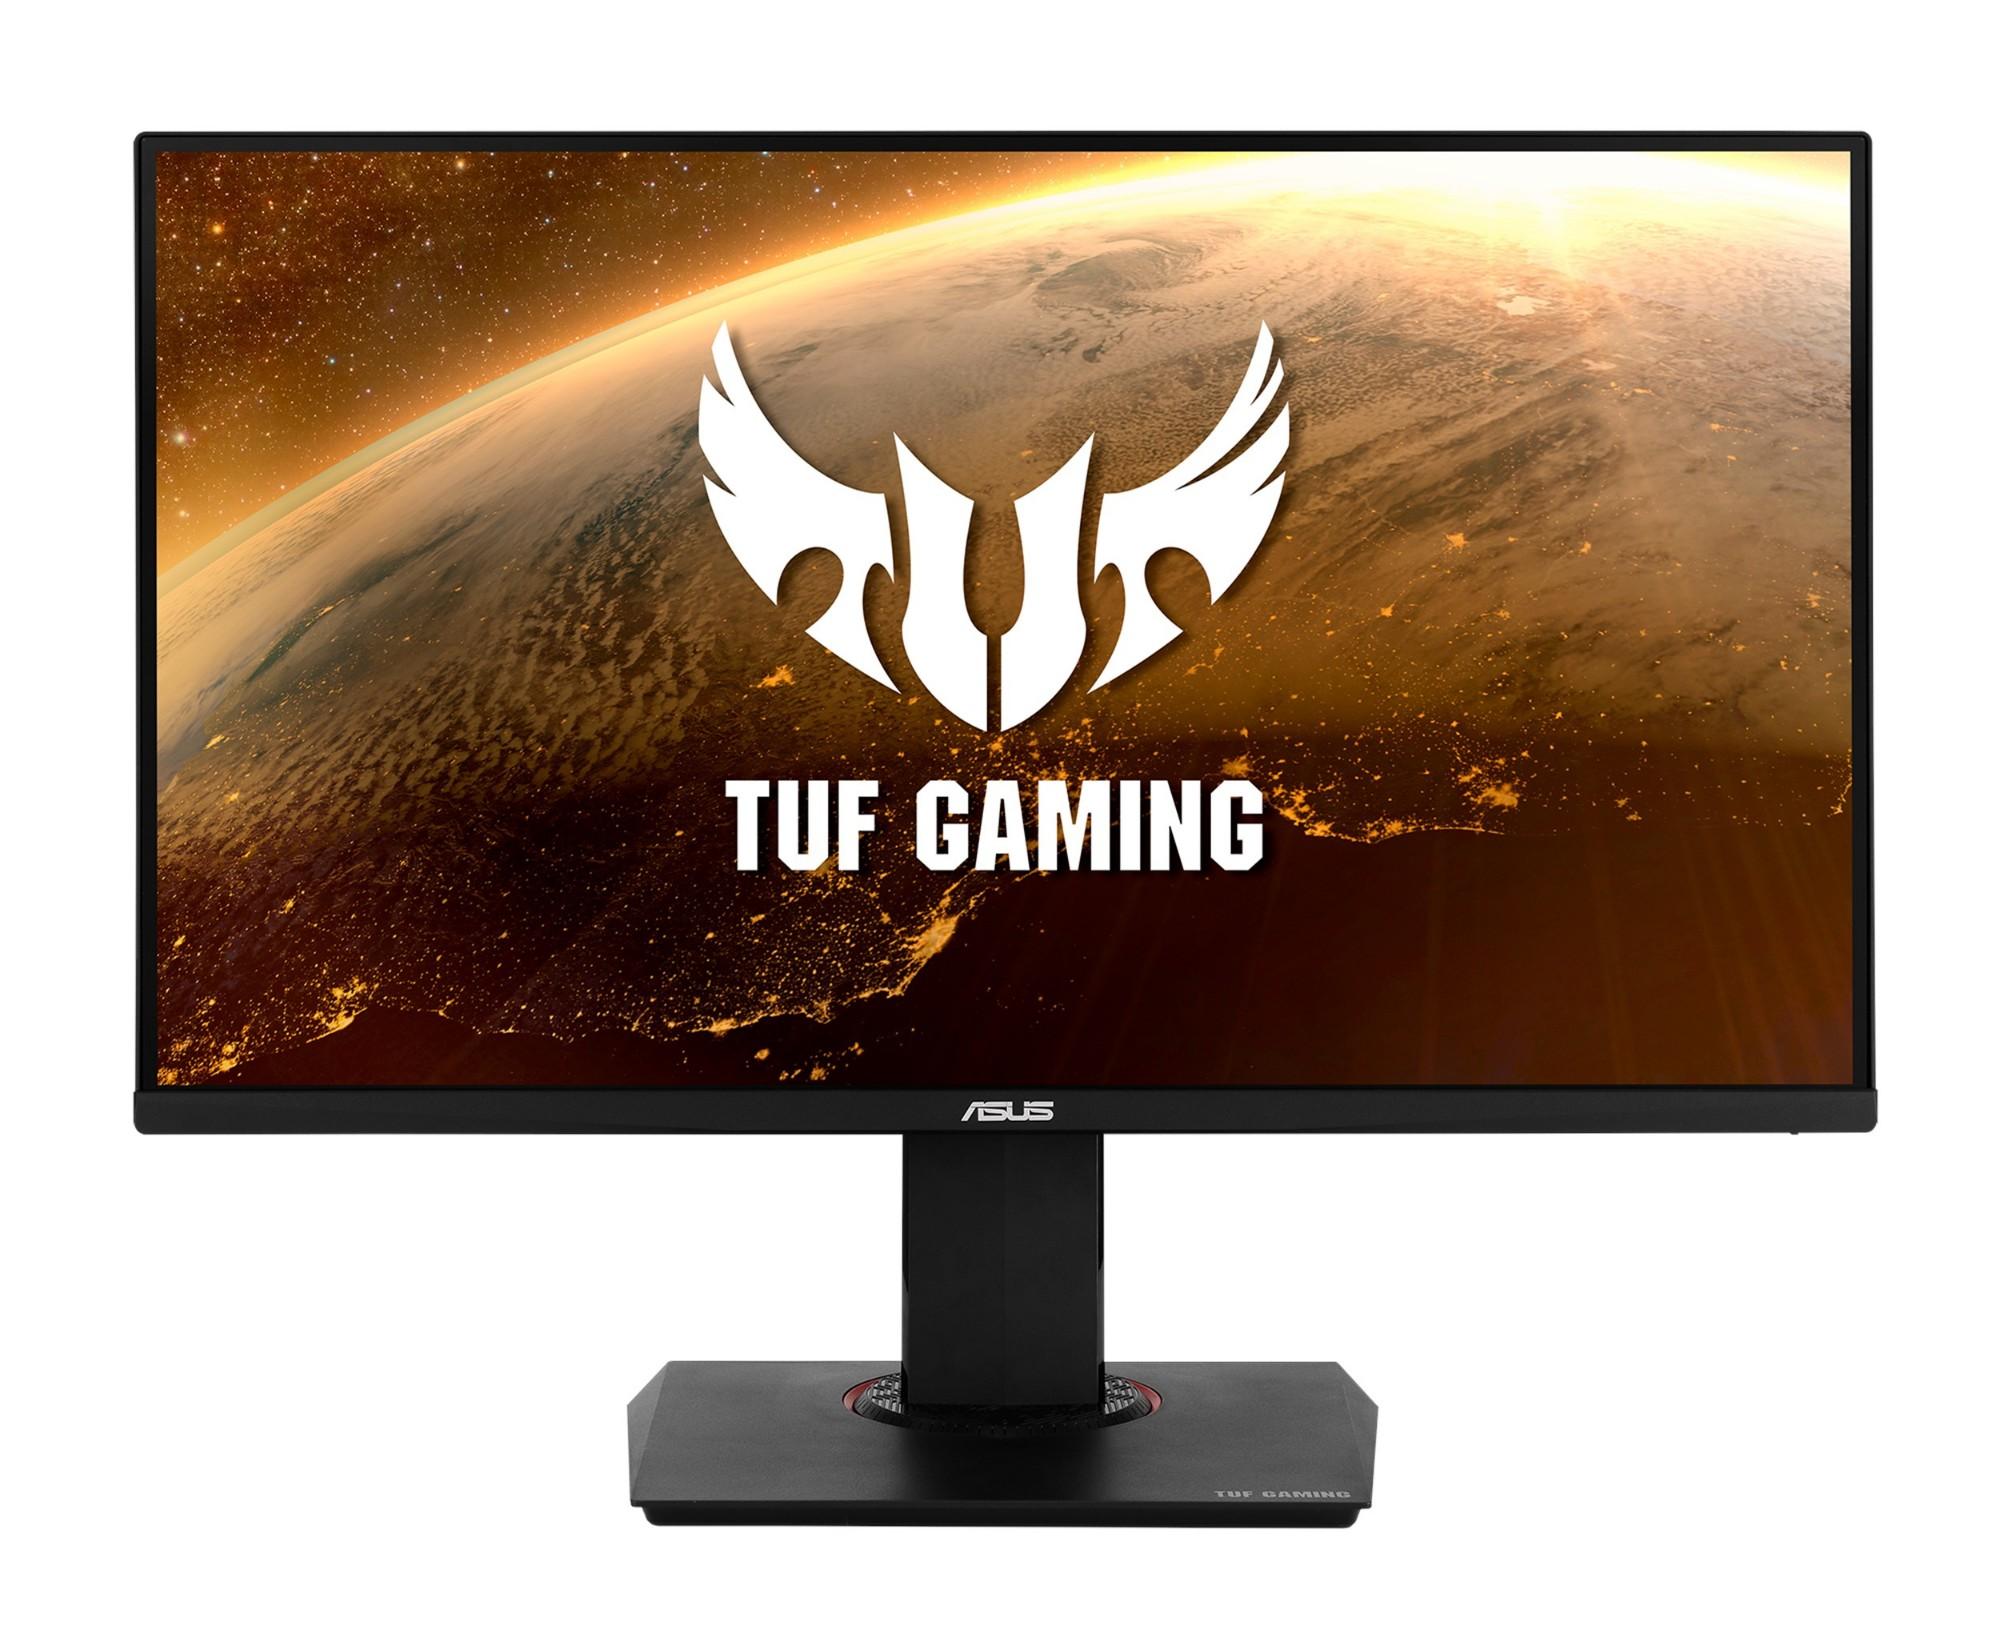 ASUS VG289Q computer monitor 71.1 cm (28